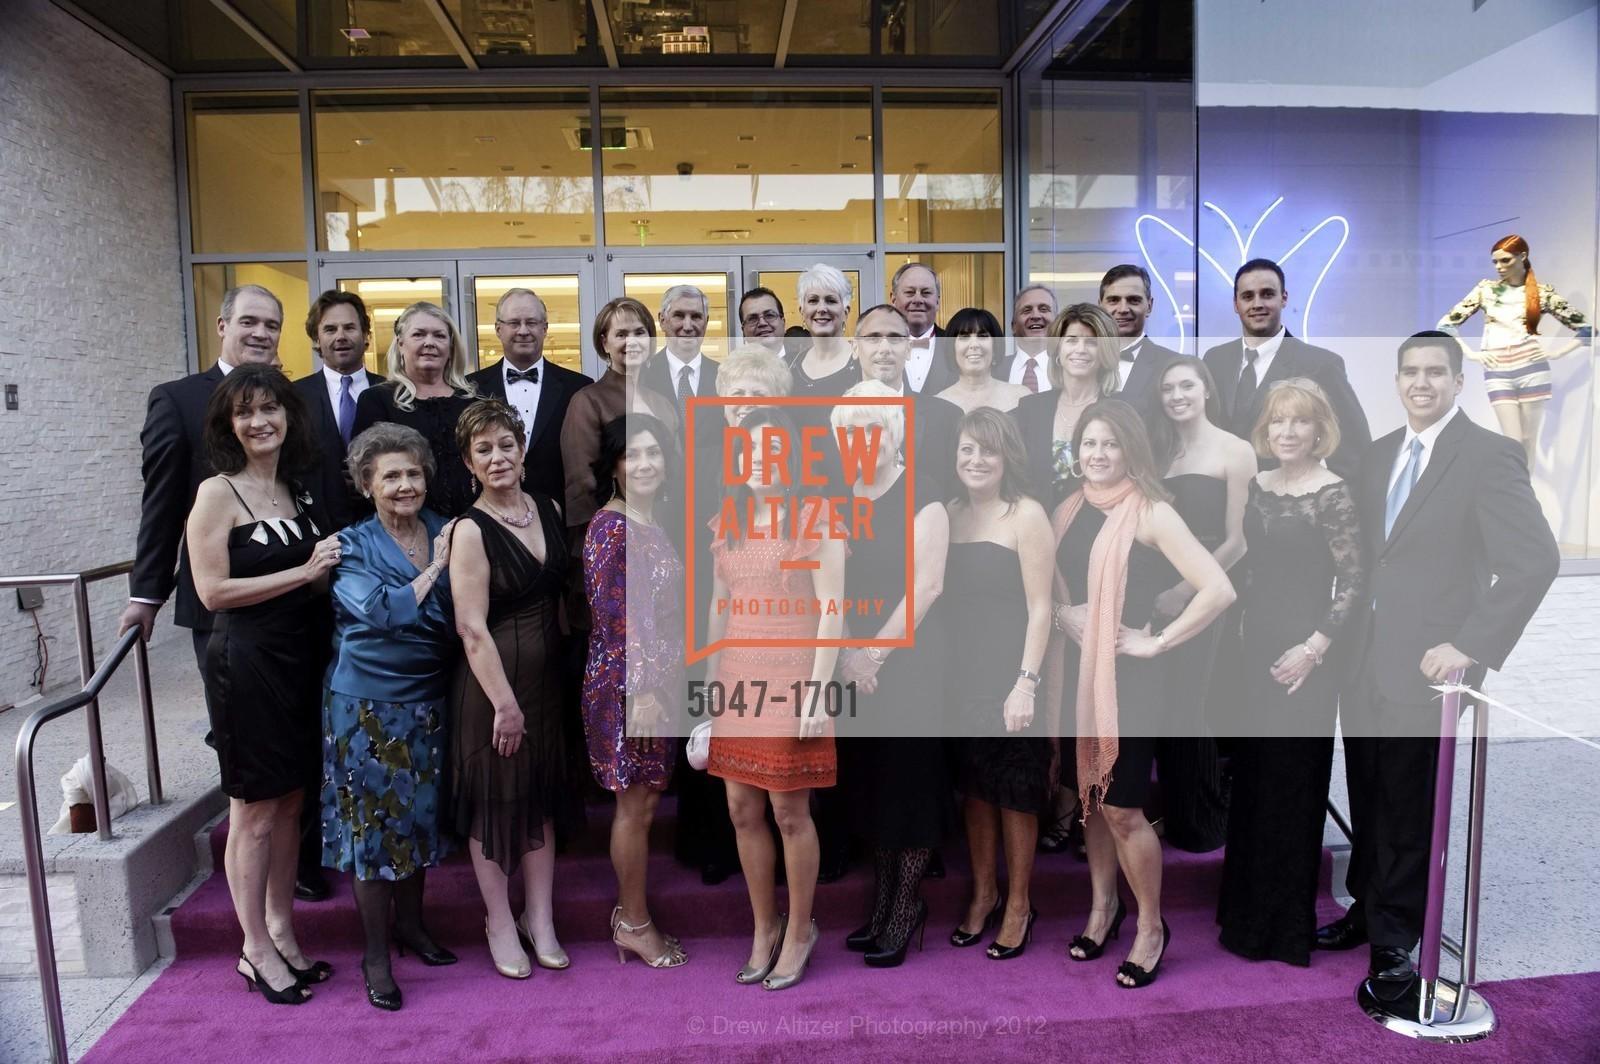 Group Photo, Photo #5047-1701